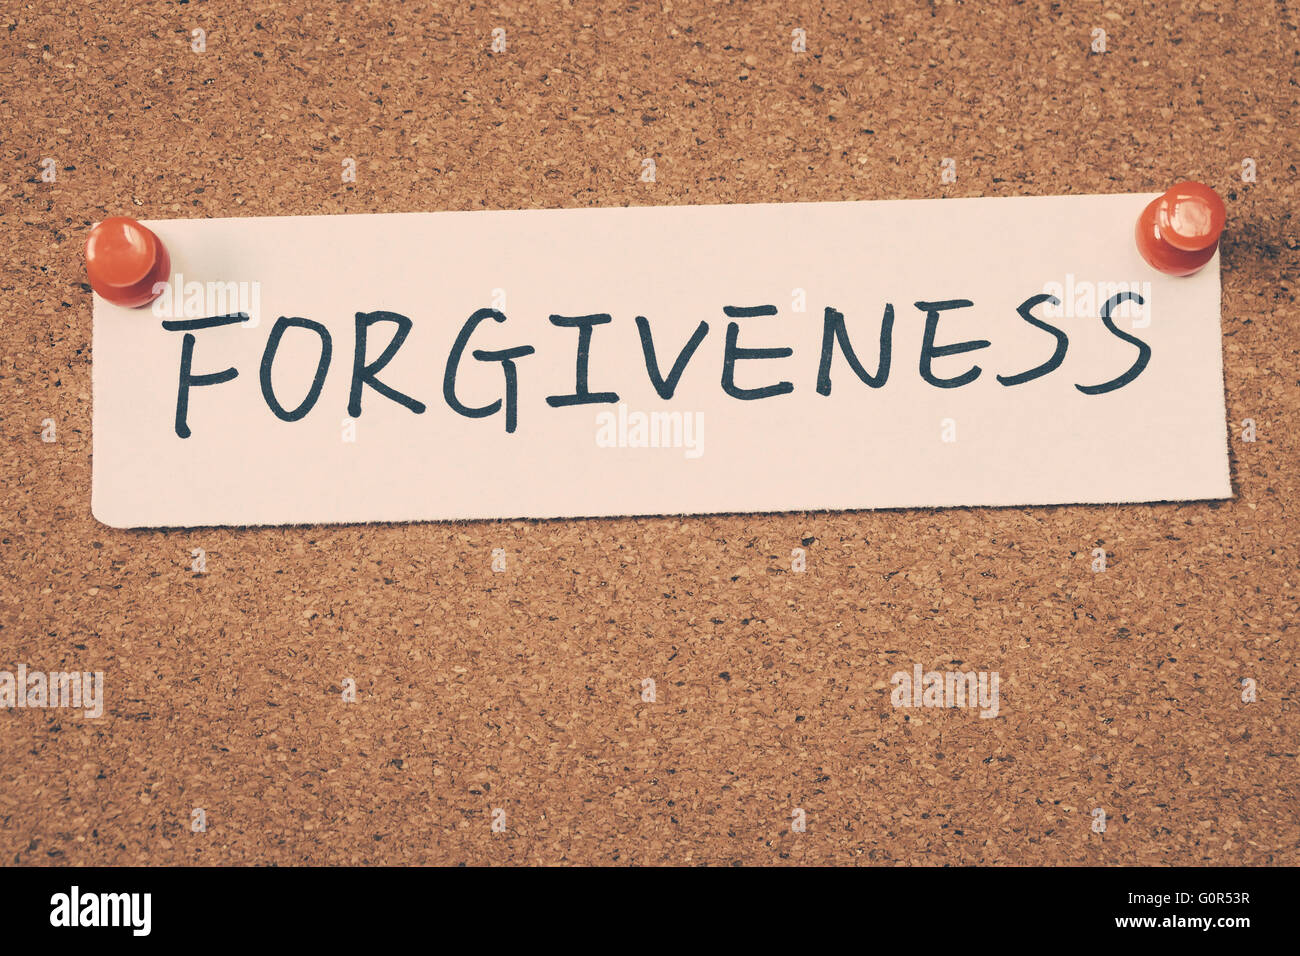 forgiveness - Stock Image